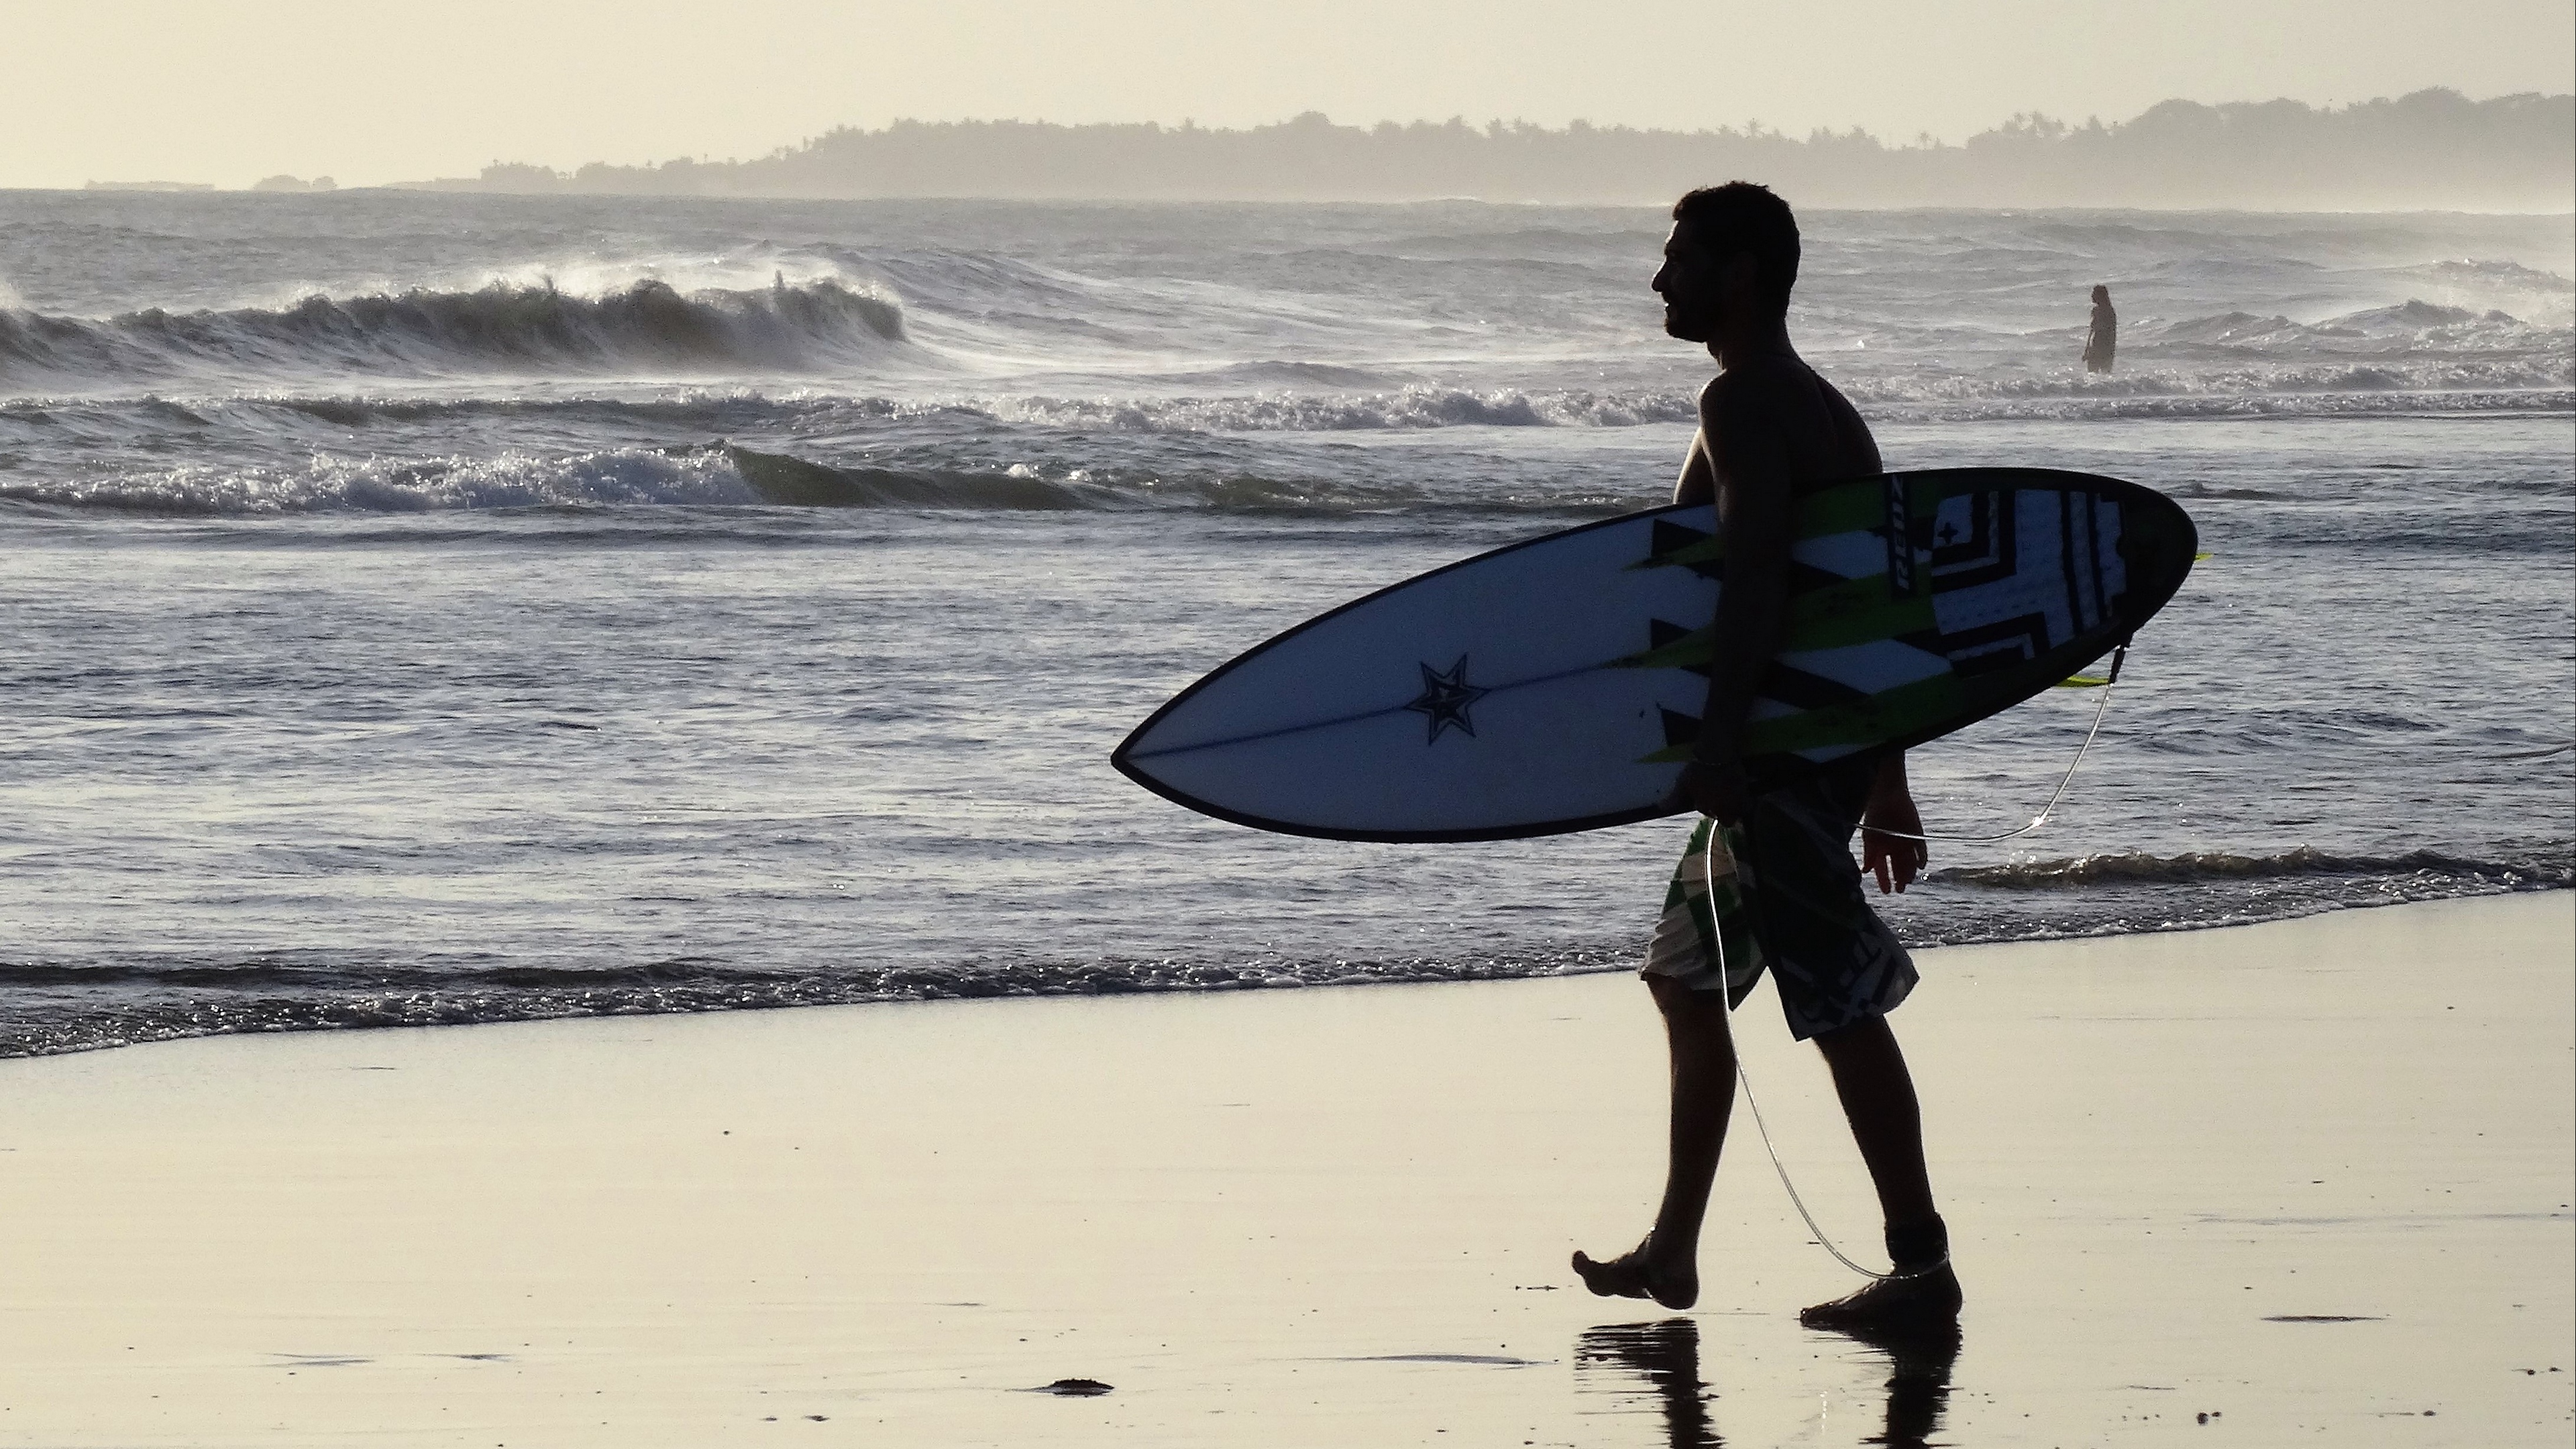 surfer bali beach surfing 4k 1540063205 - surfer, bali, beach, surfing 4k - Surfer, Beach, bali